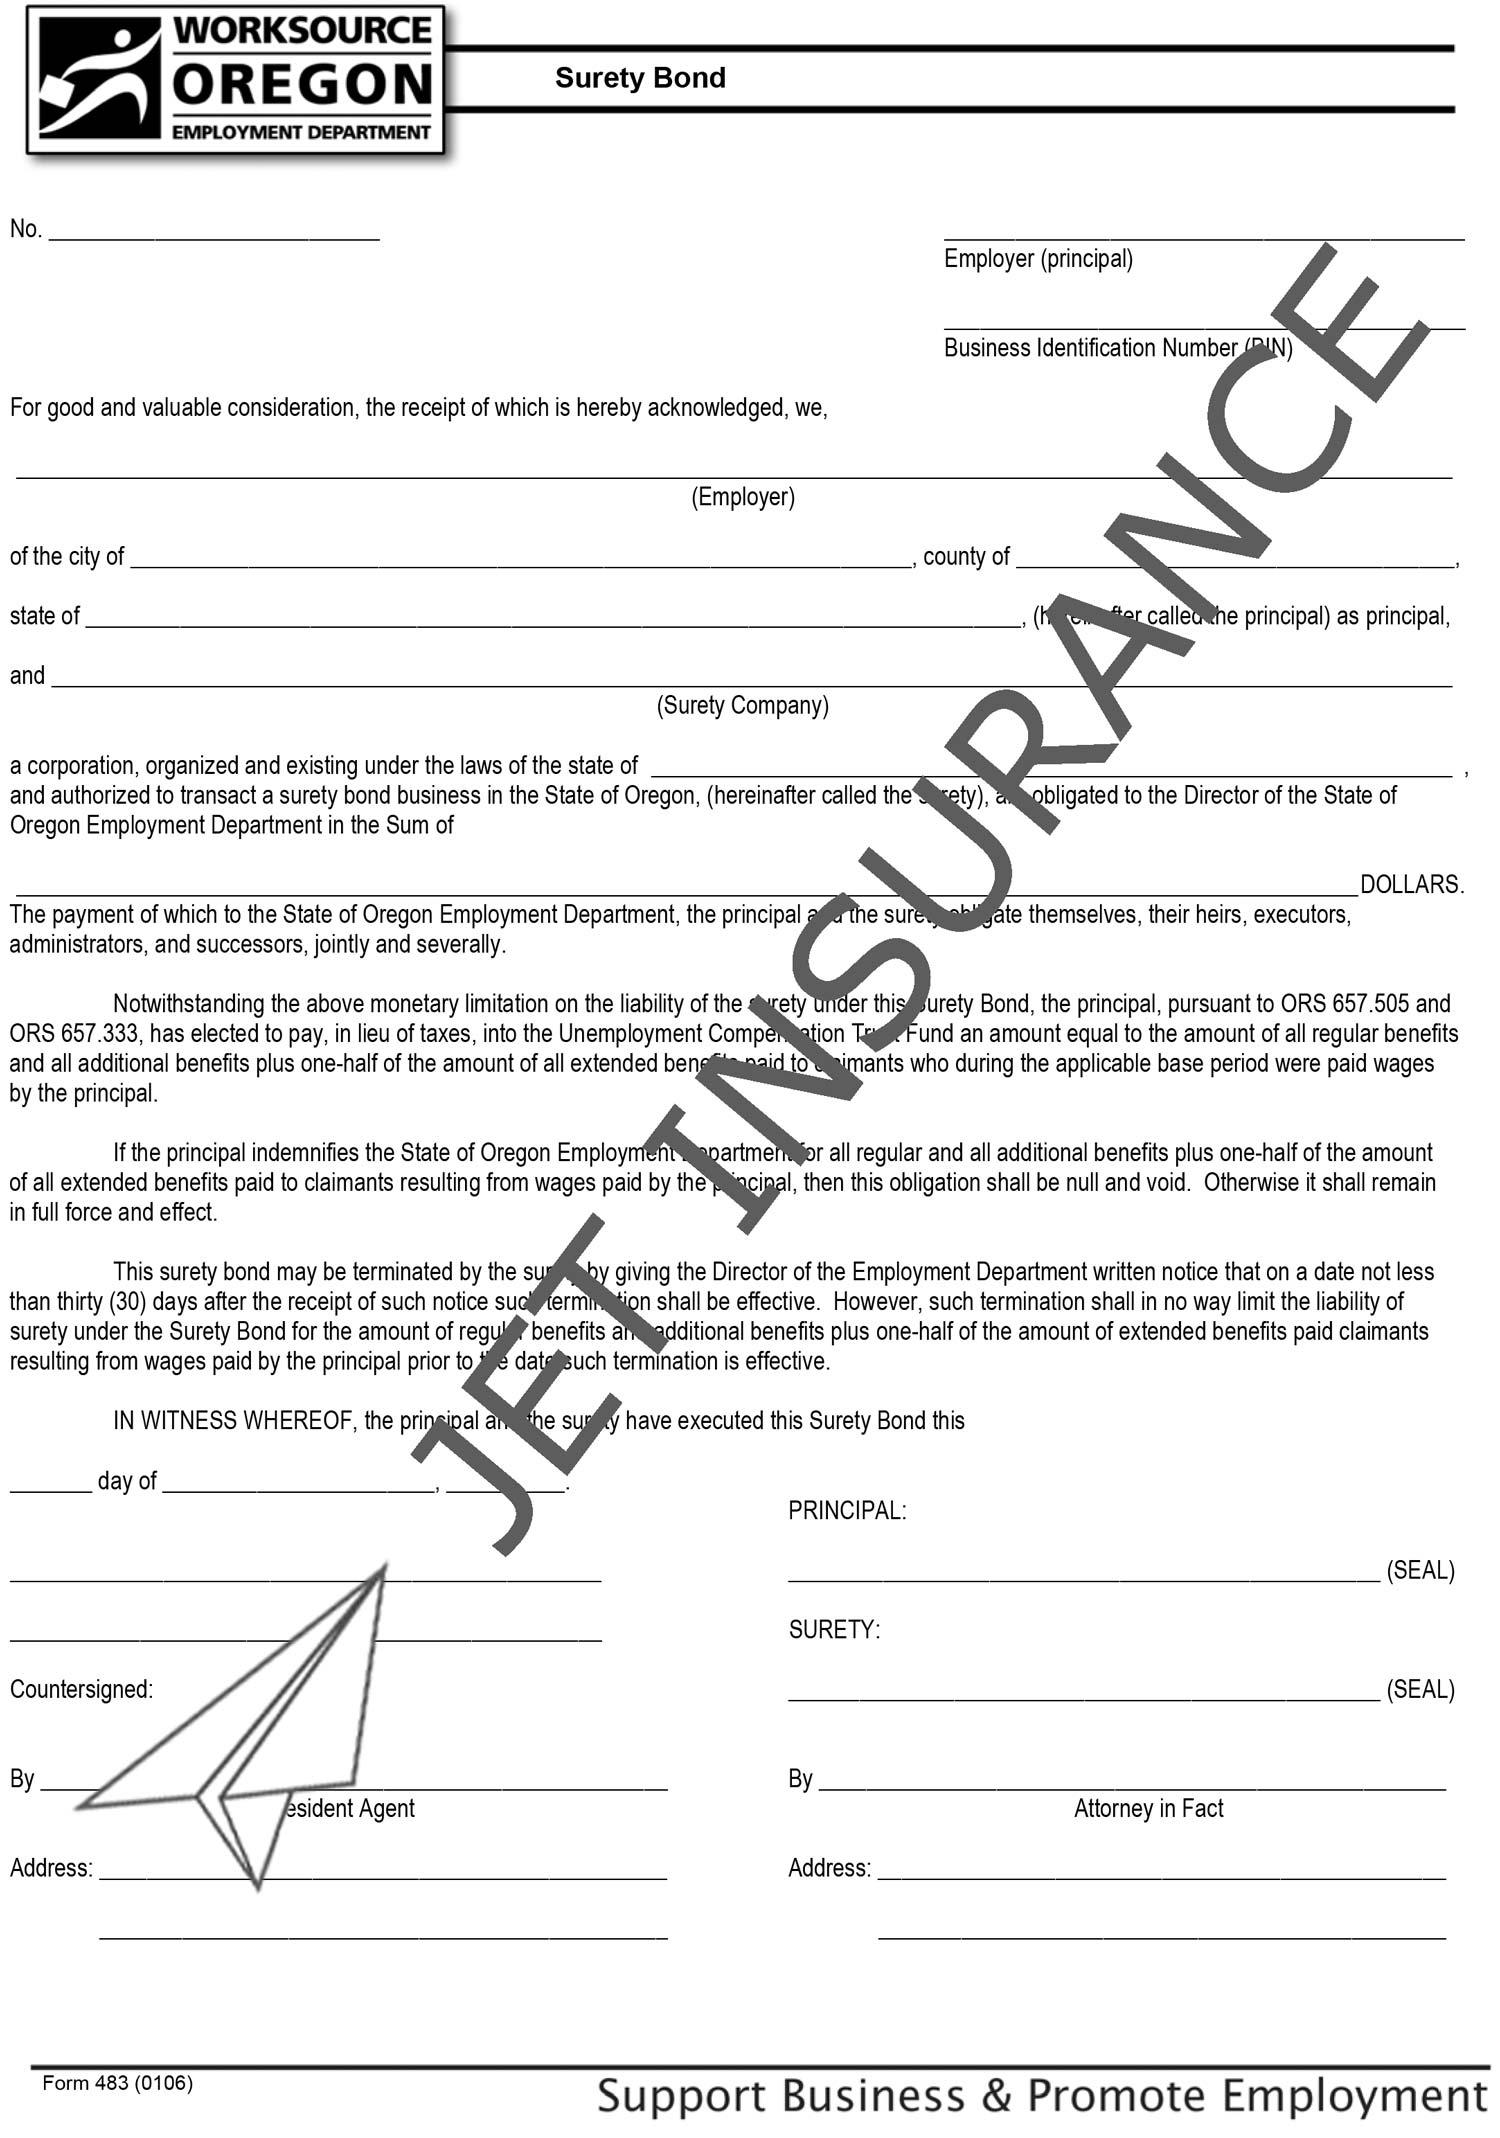 Oregon Unemployment Compensation Trust Fund Bond Form